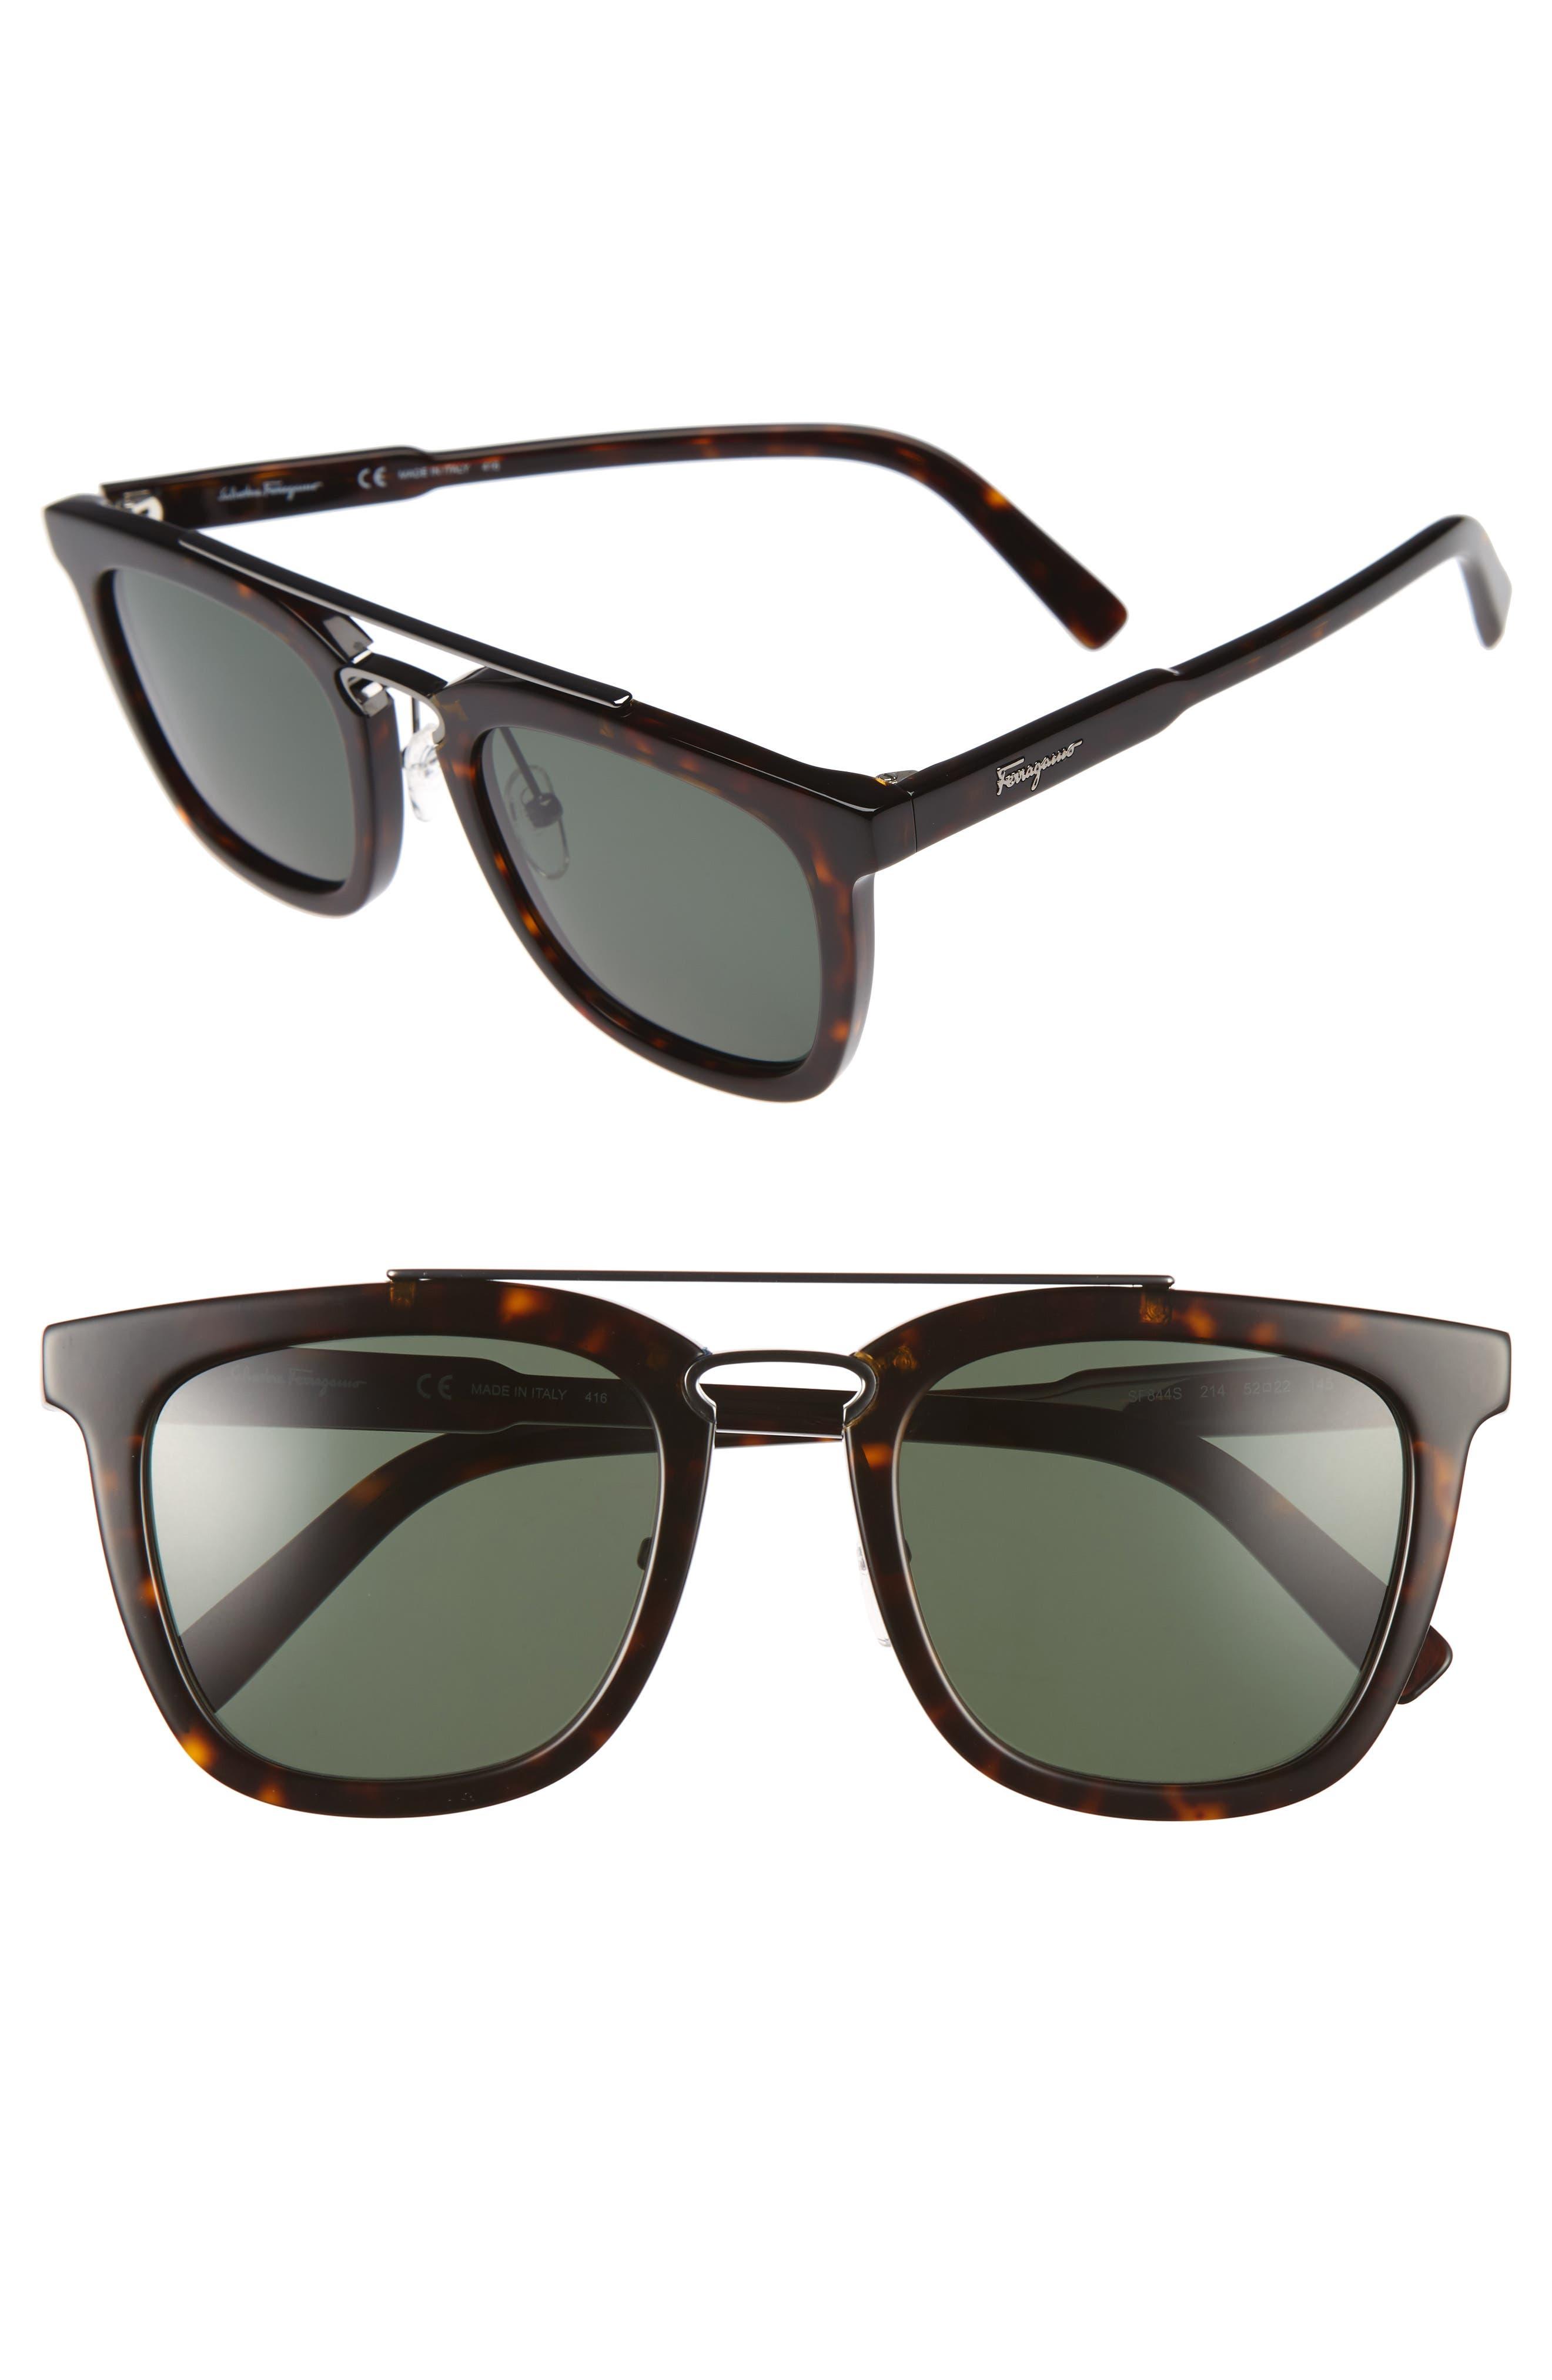 Main Image - Salvatore Ferragamo 52mm Sunglasses